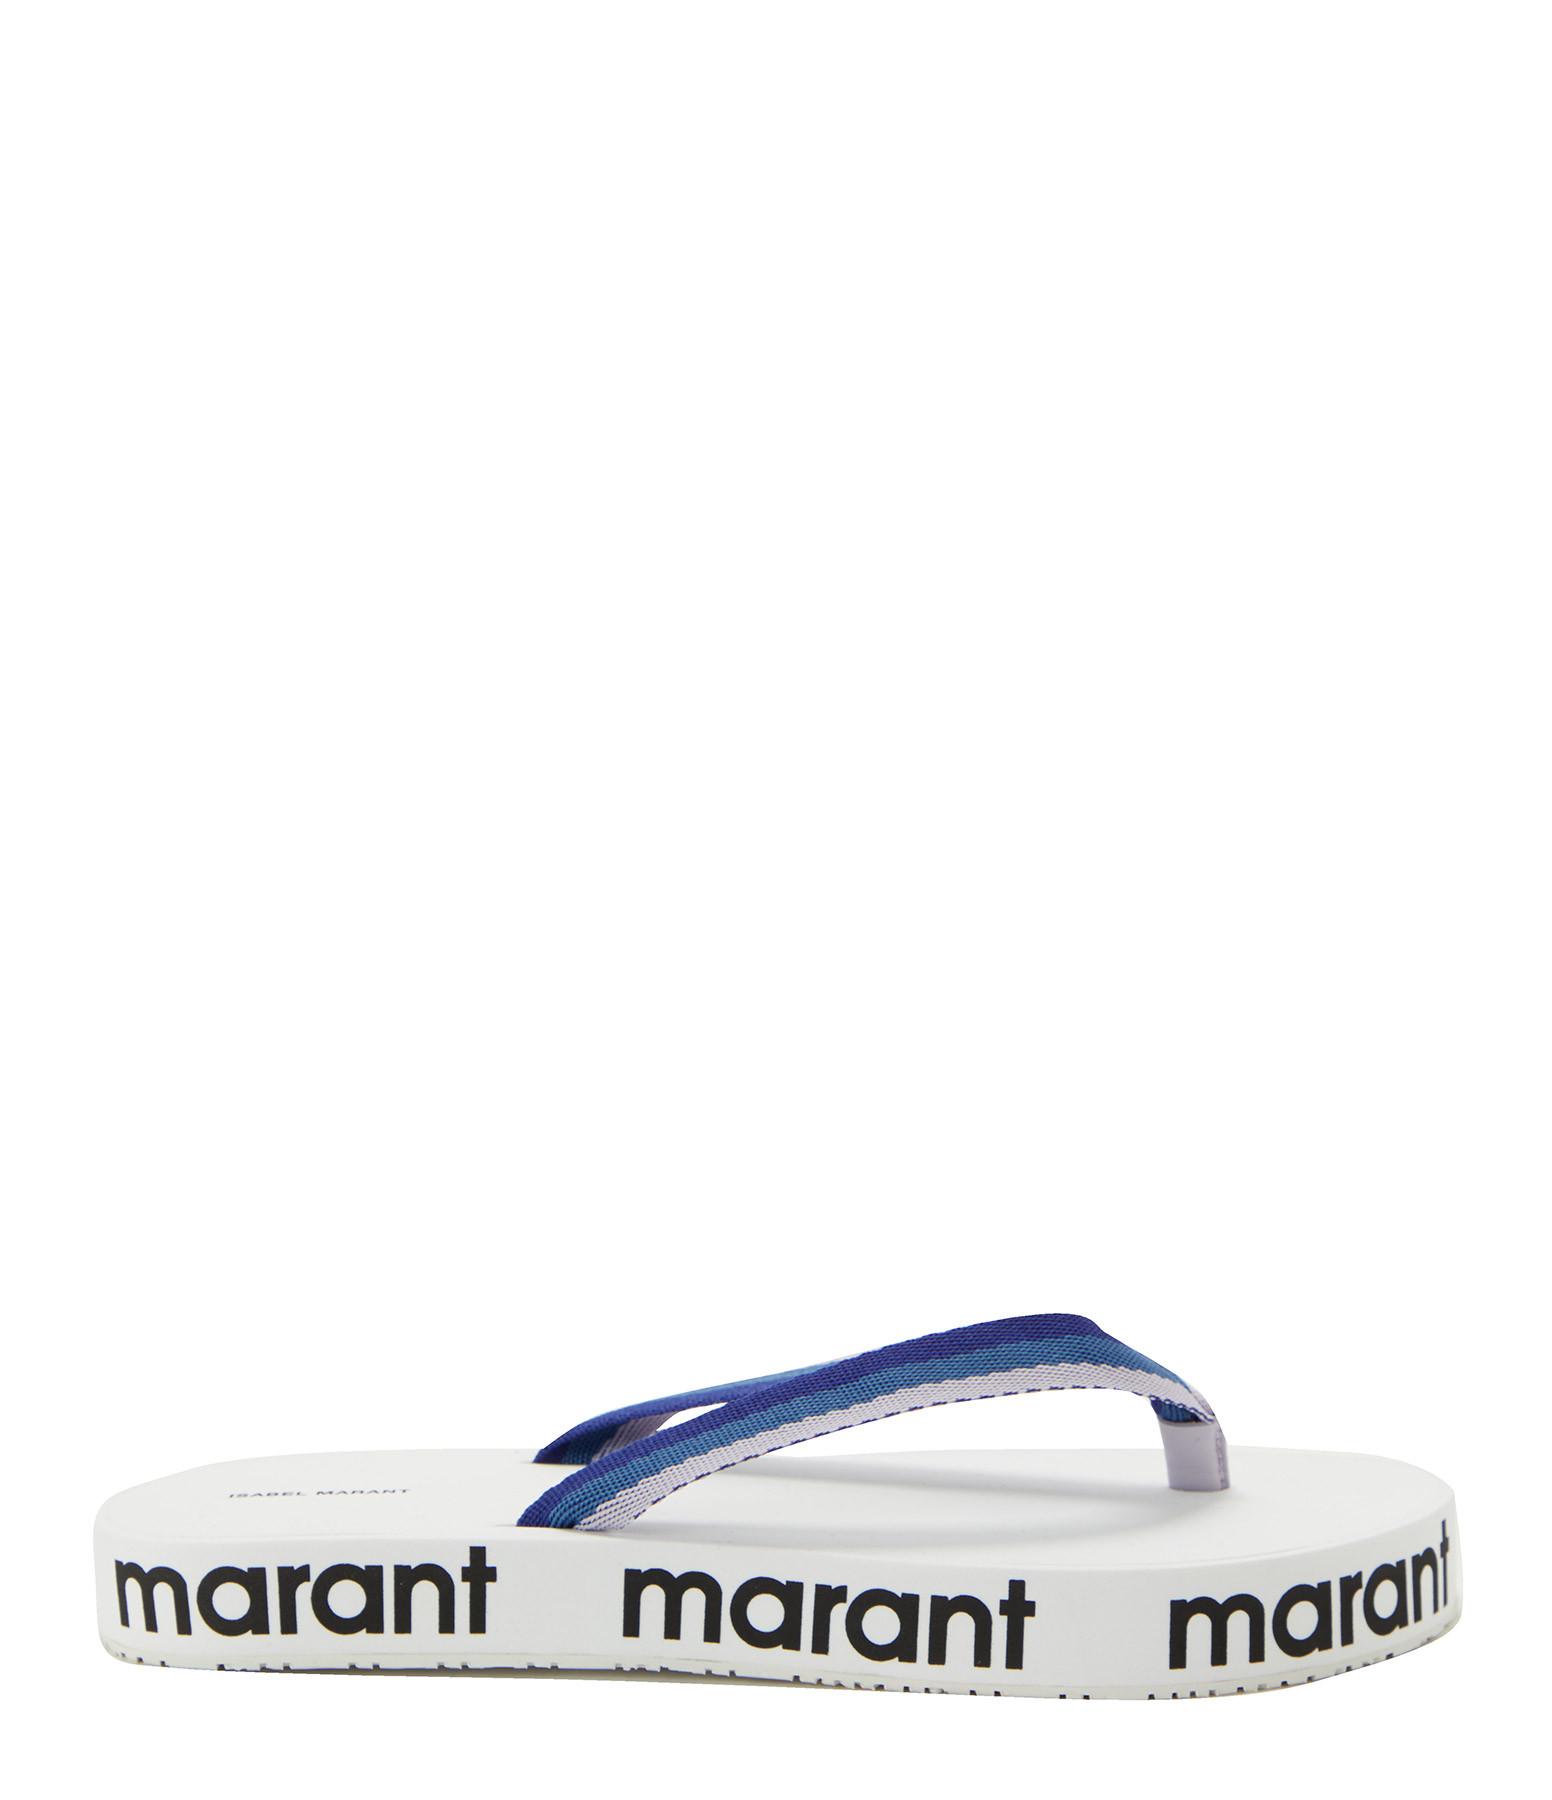 ISABEL MARANT - Tongs Compensées Tae Bleu